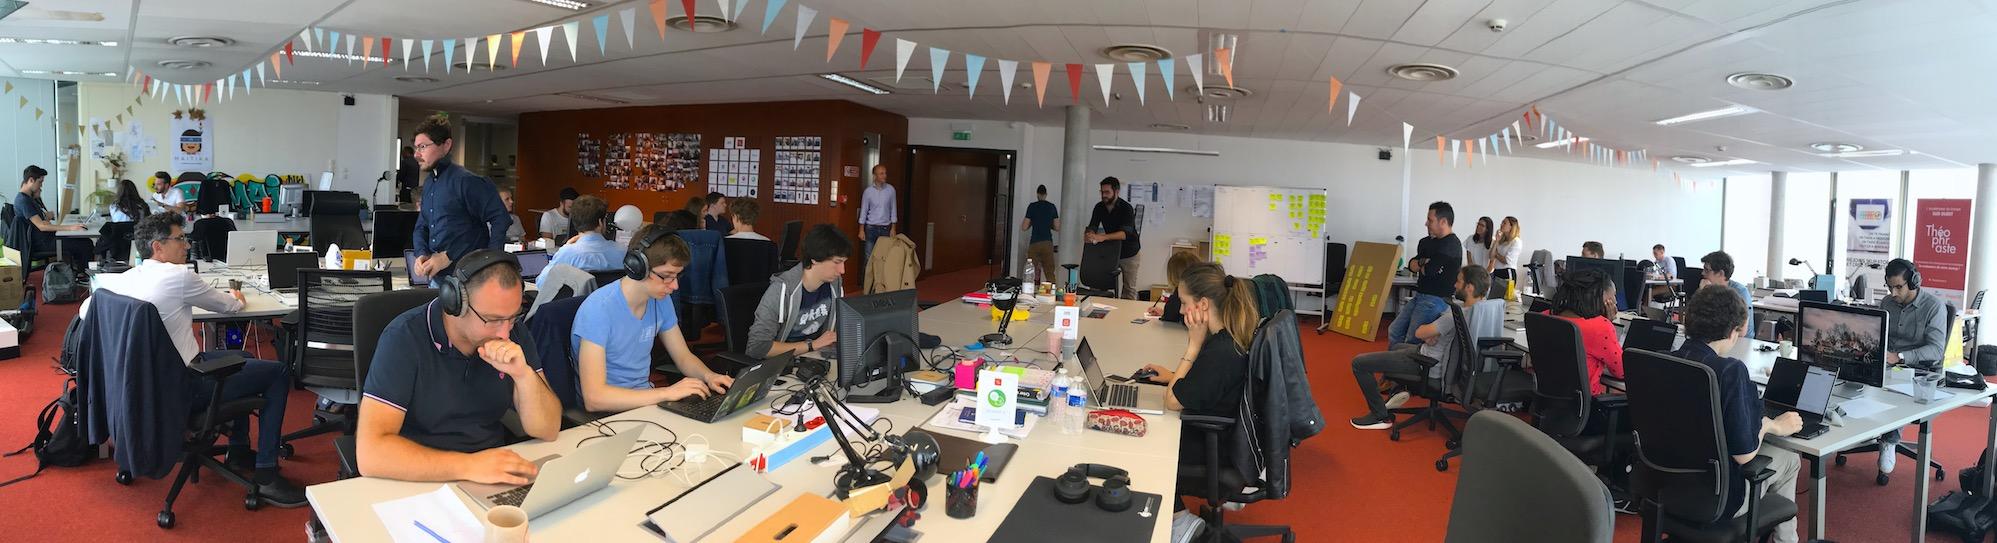 Plateau startups Sud Ouest